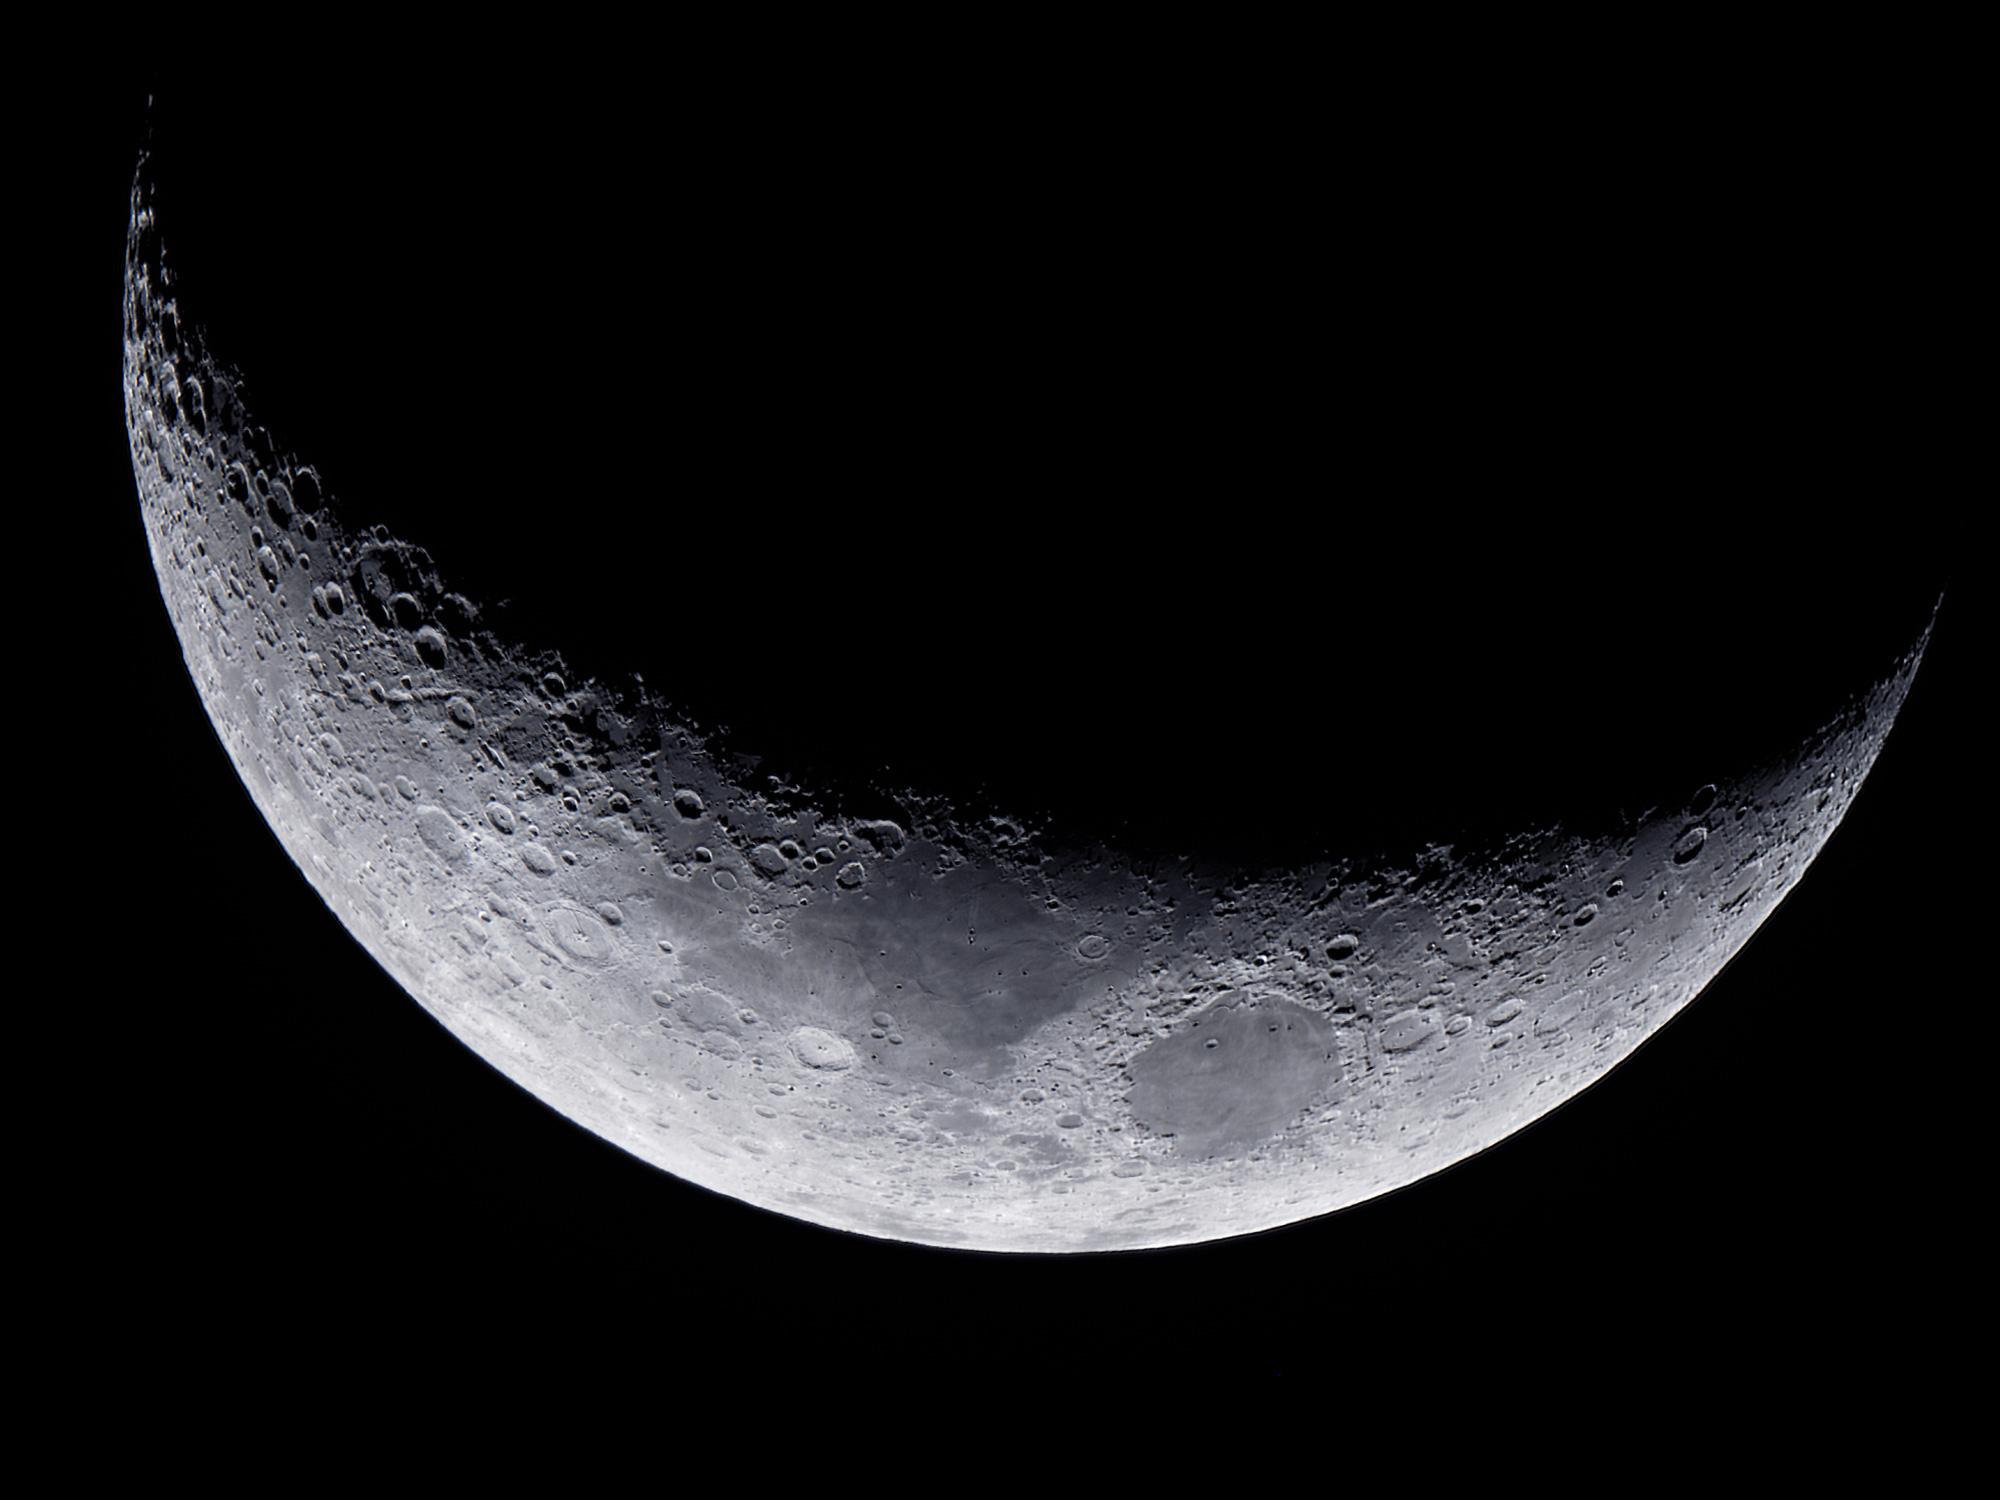 Wiliam Optics GTF102 OMD EM5 mark 2 high res moon astrophotography